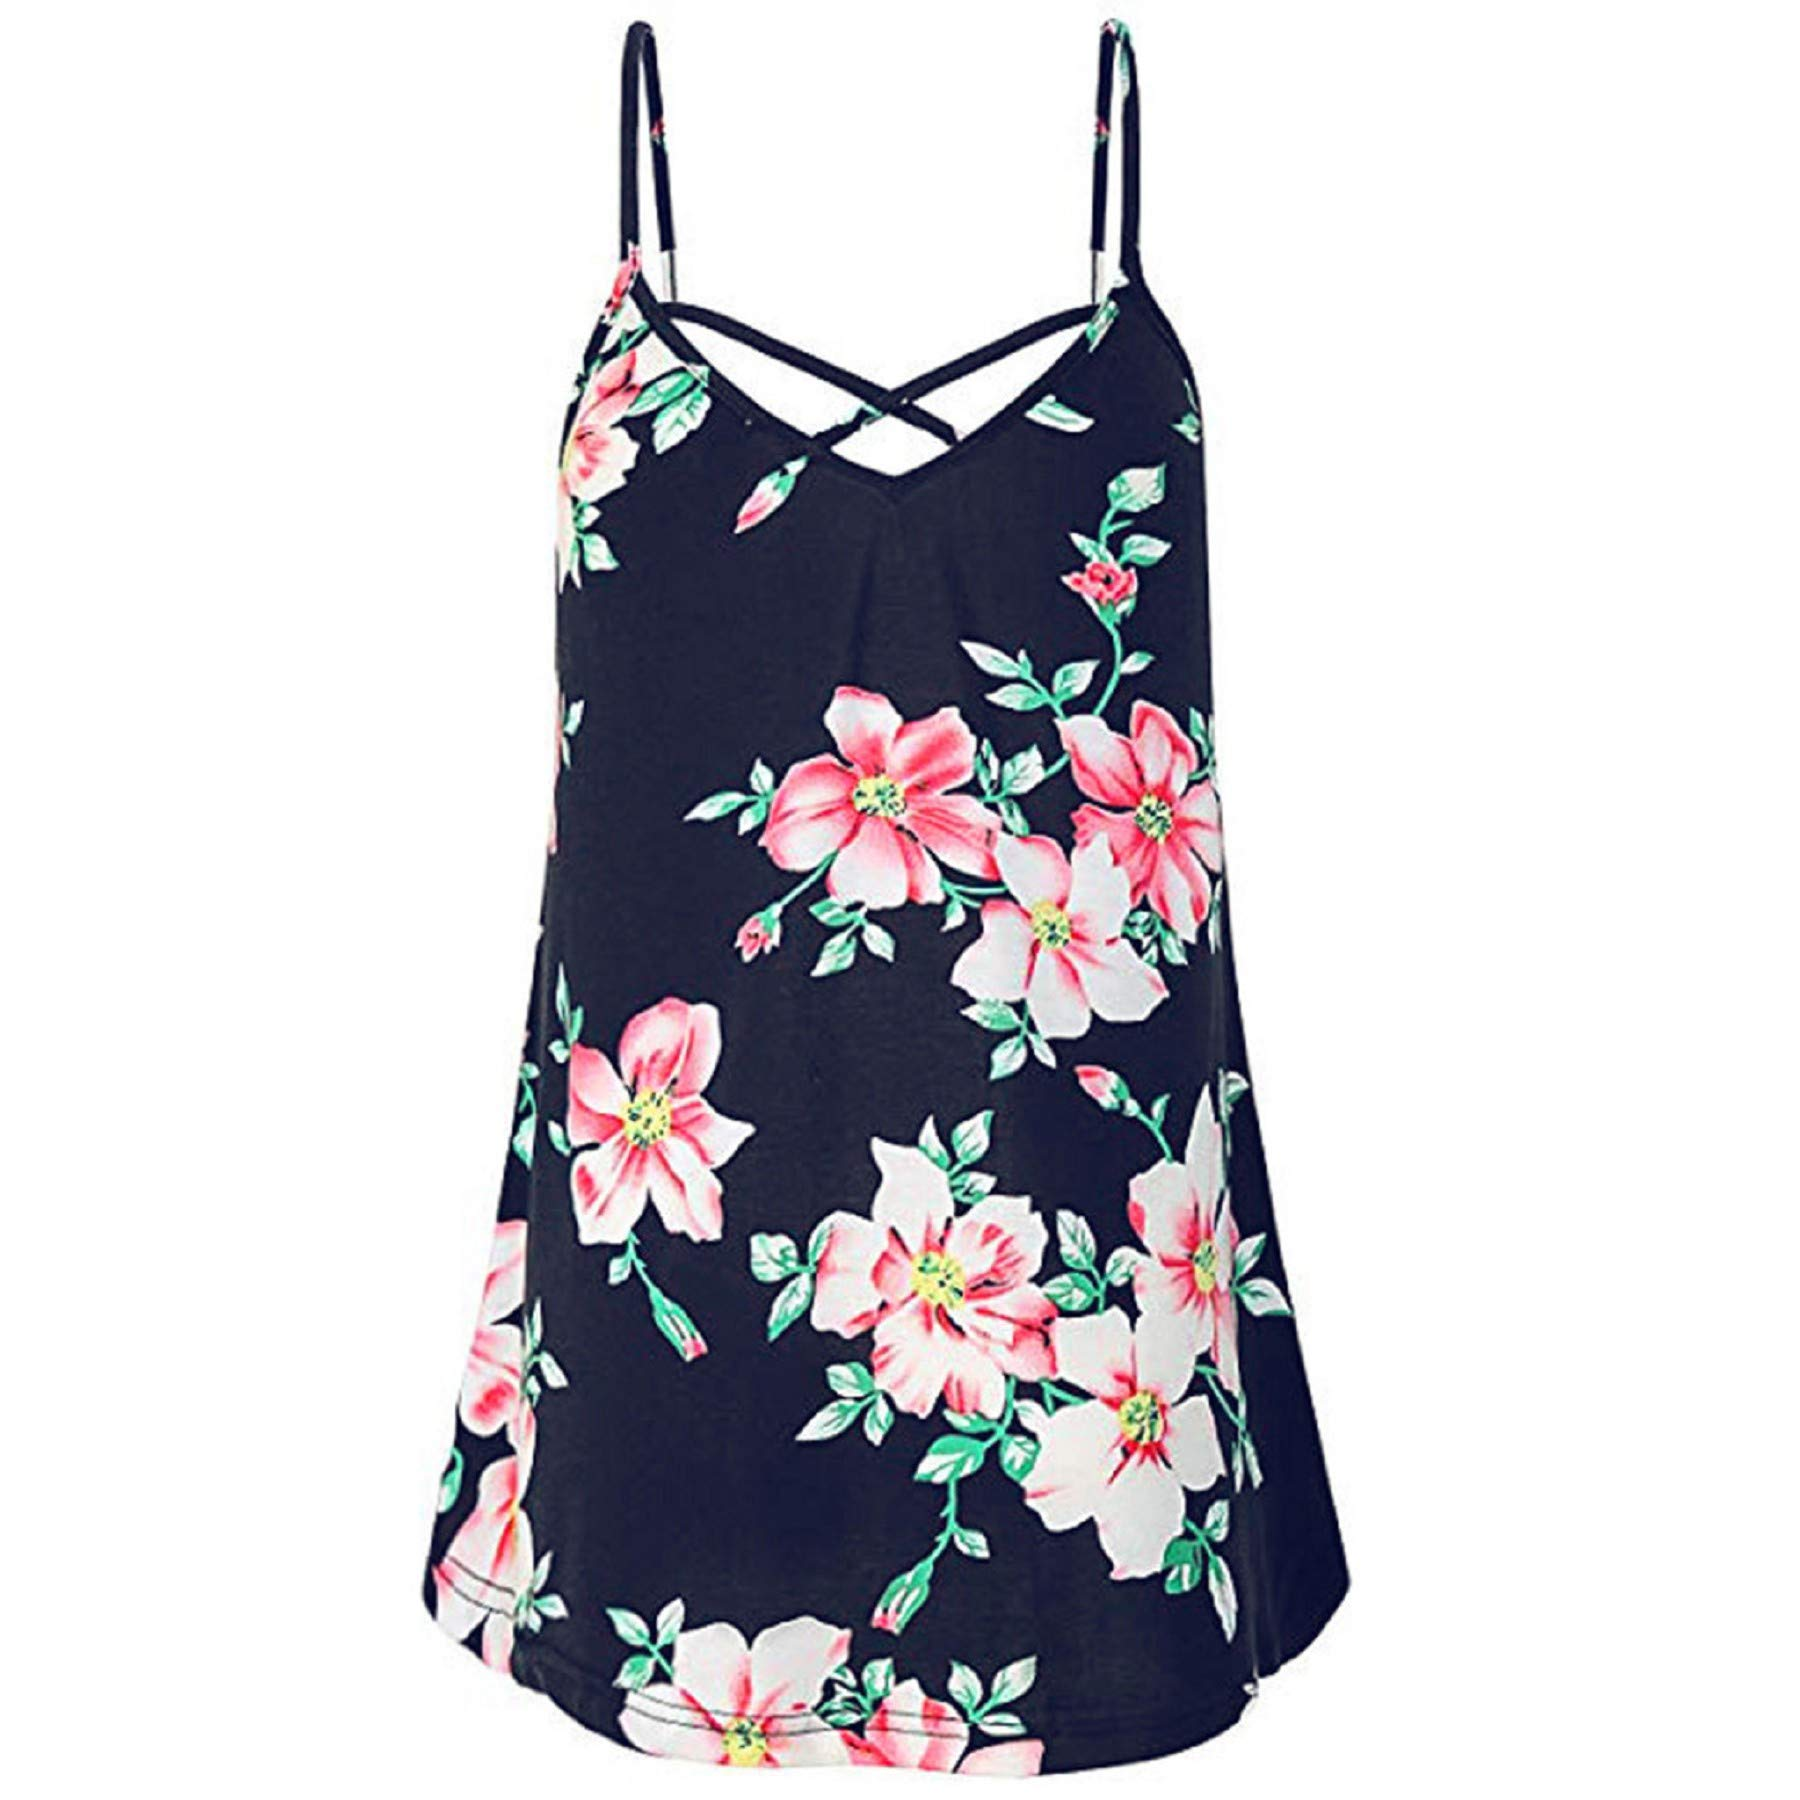 Women's Casual Sleeveless Floral Loose Flowy Tank Tops Summer Criss Cross Spaghetti Strap Vest Top T Shirt Blouse Navy